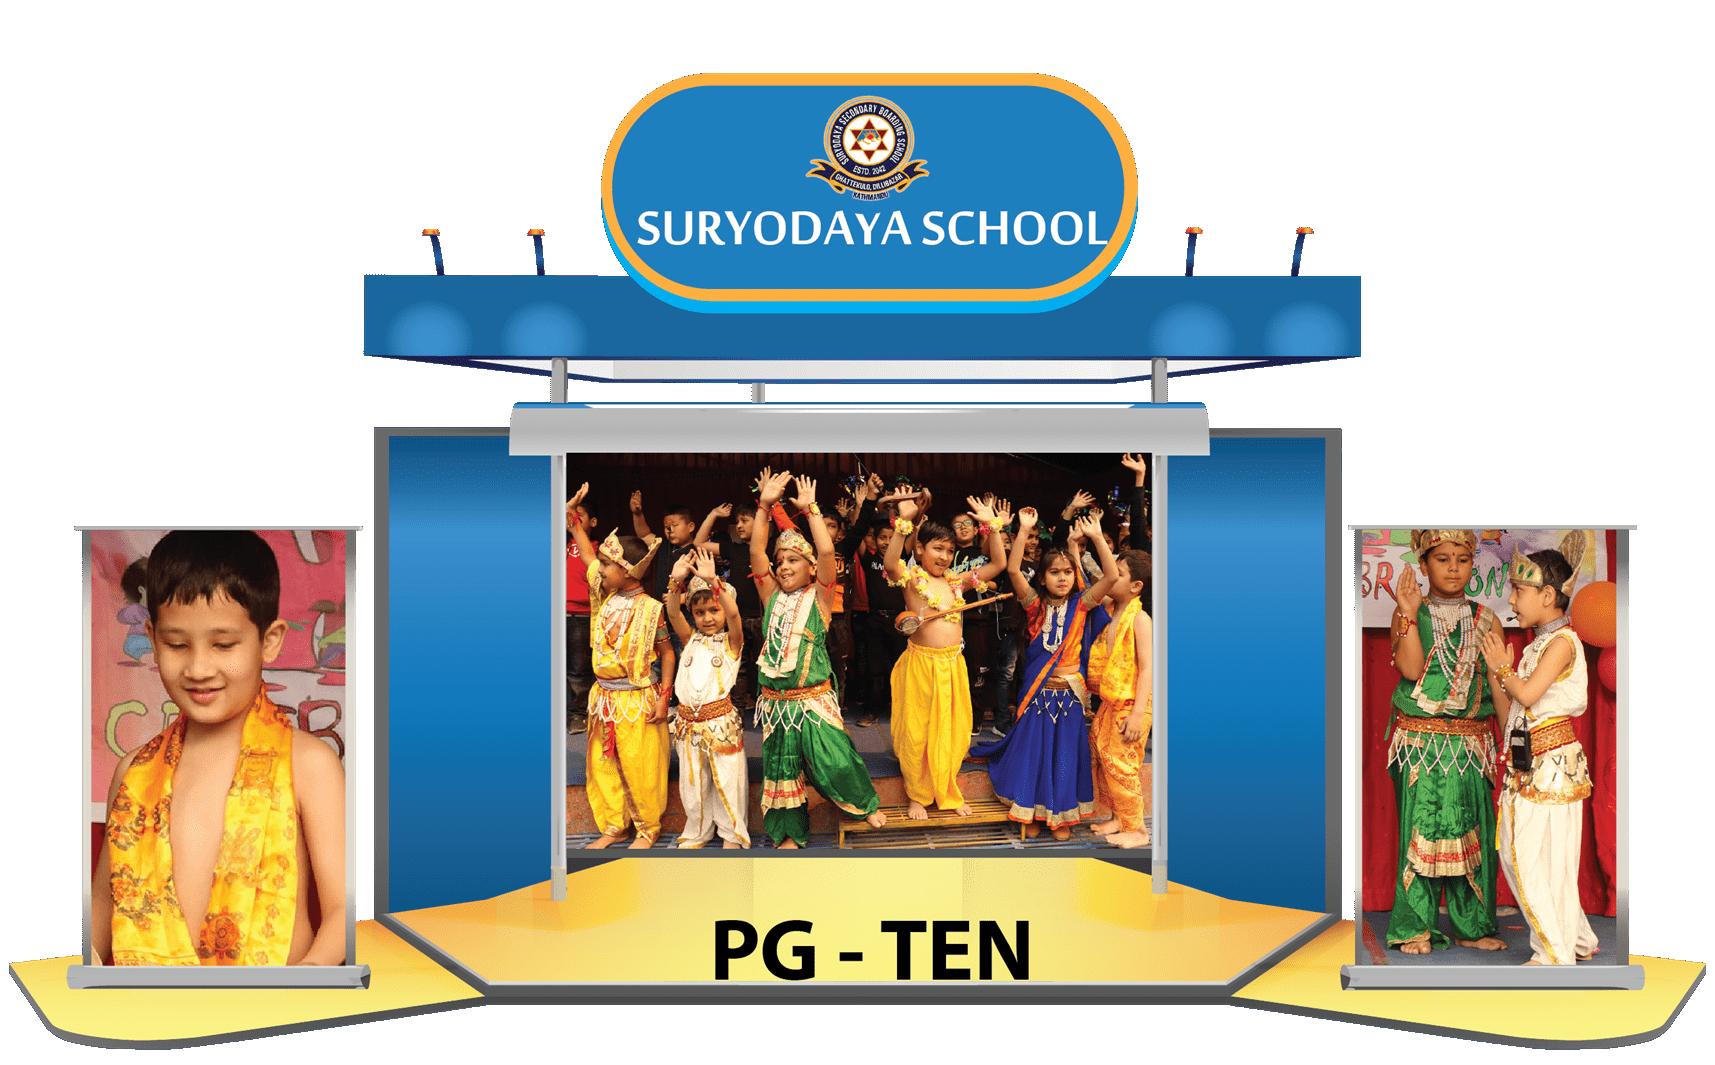 Suryodaya Secondary Boarding School